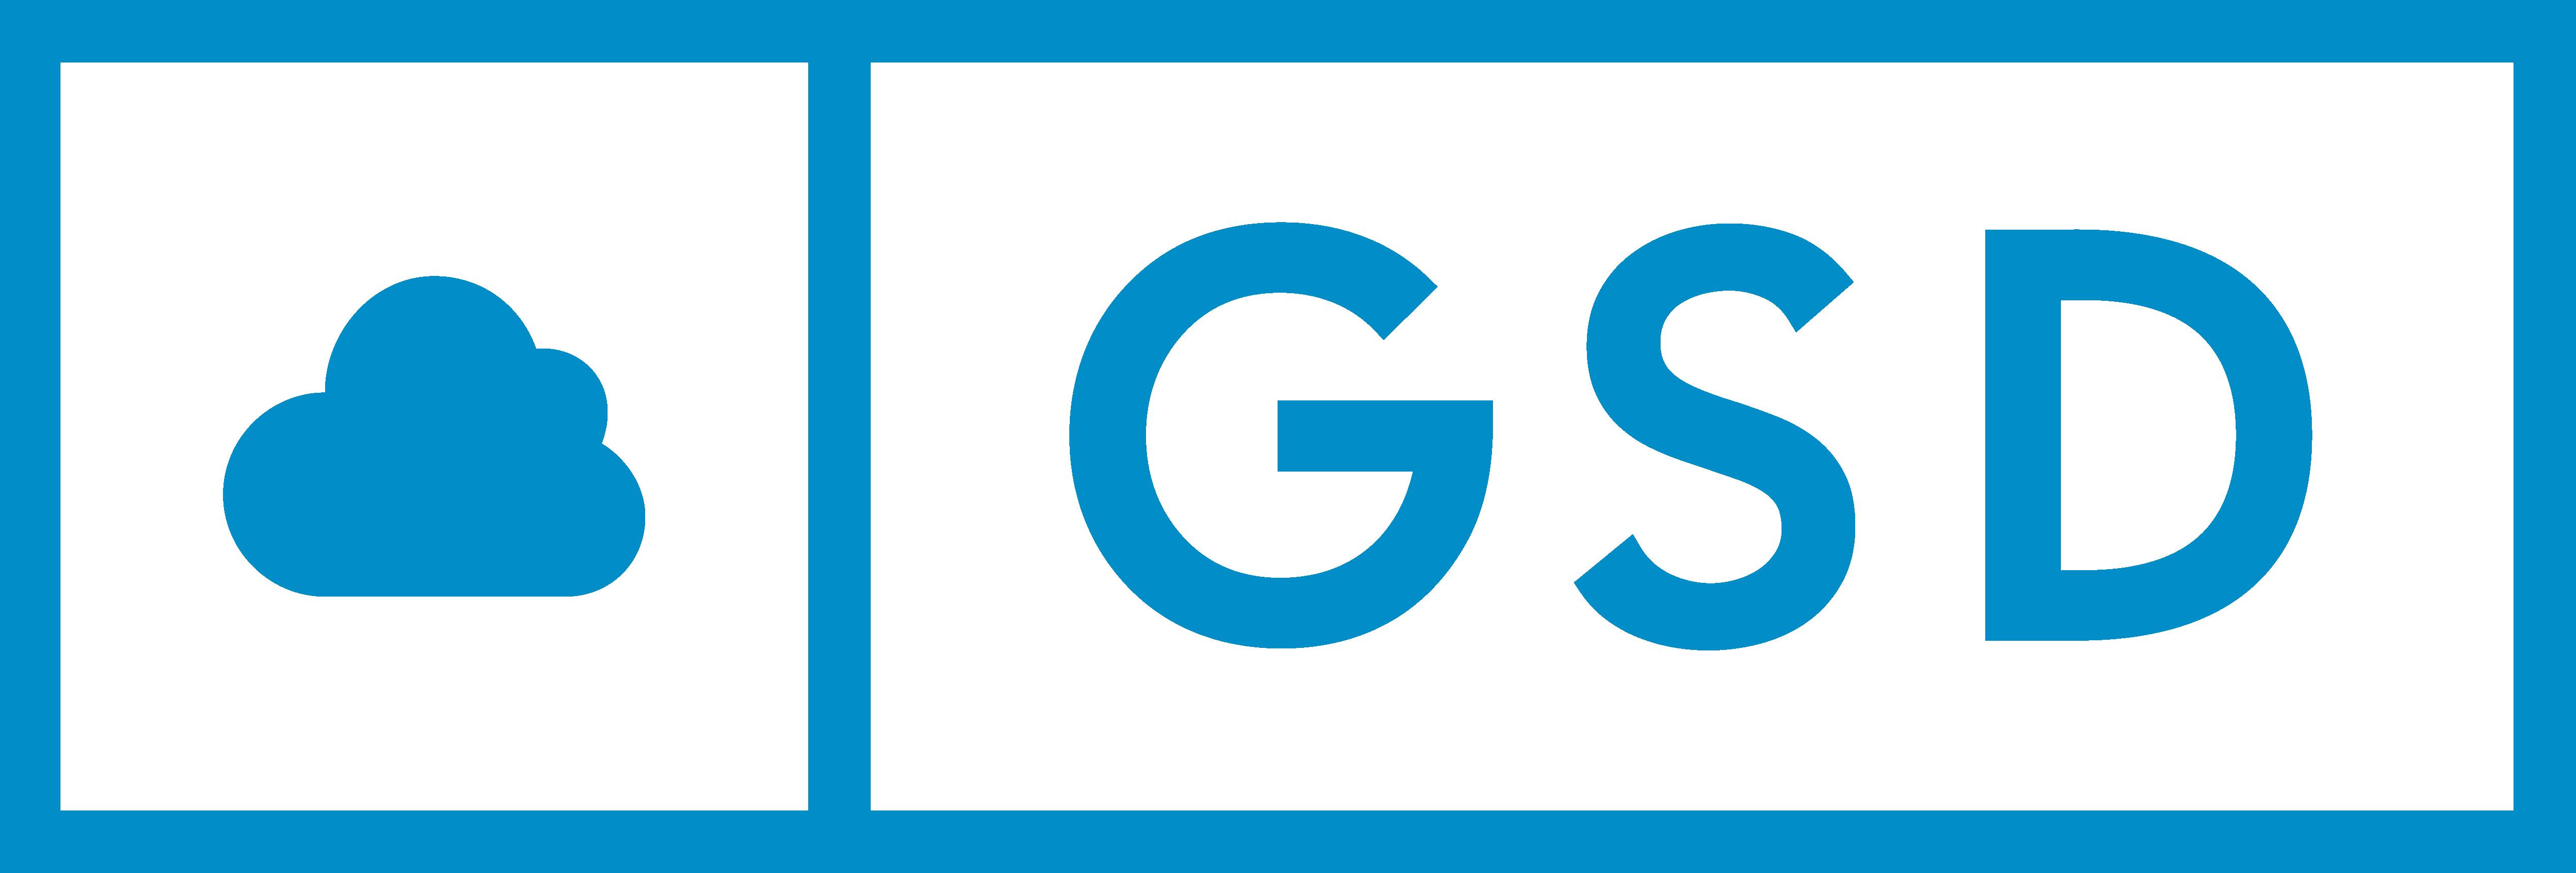 Audaxium is now GSD Company